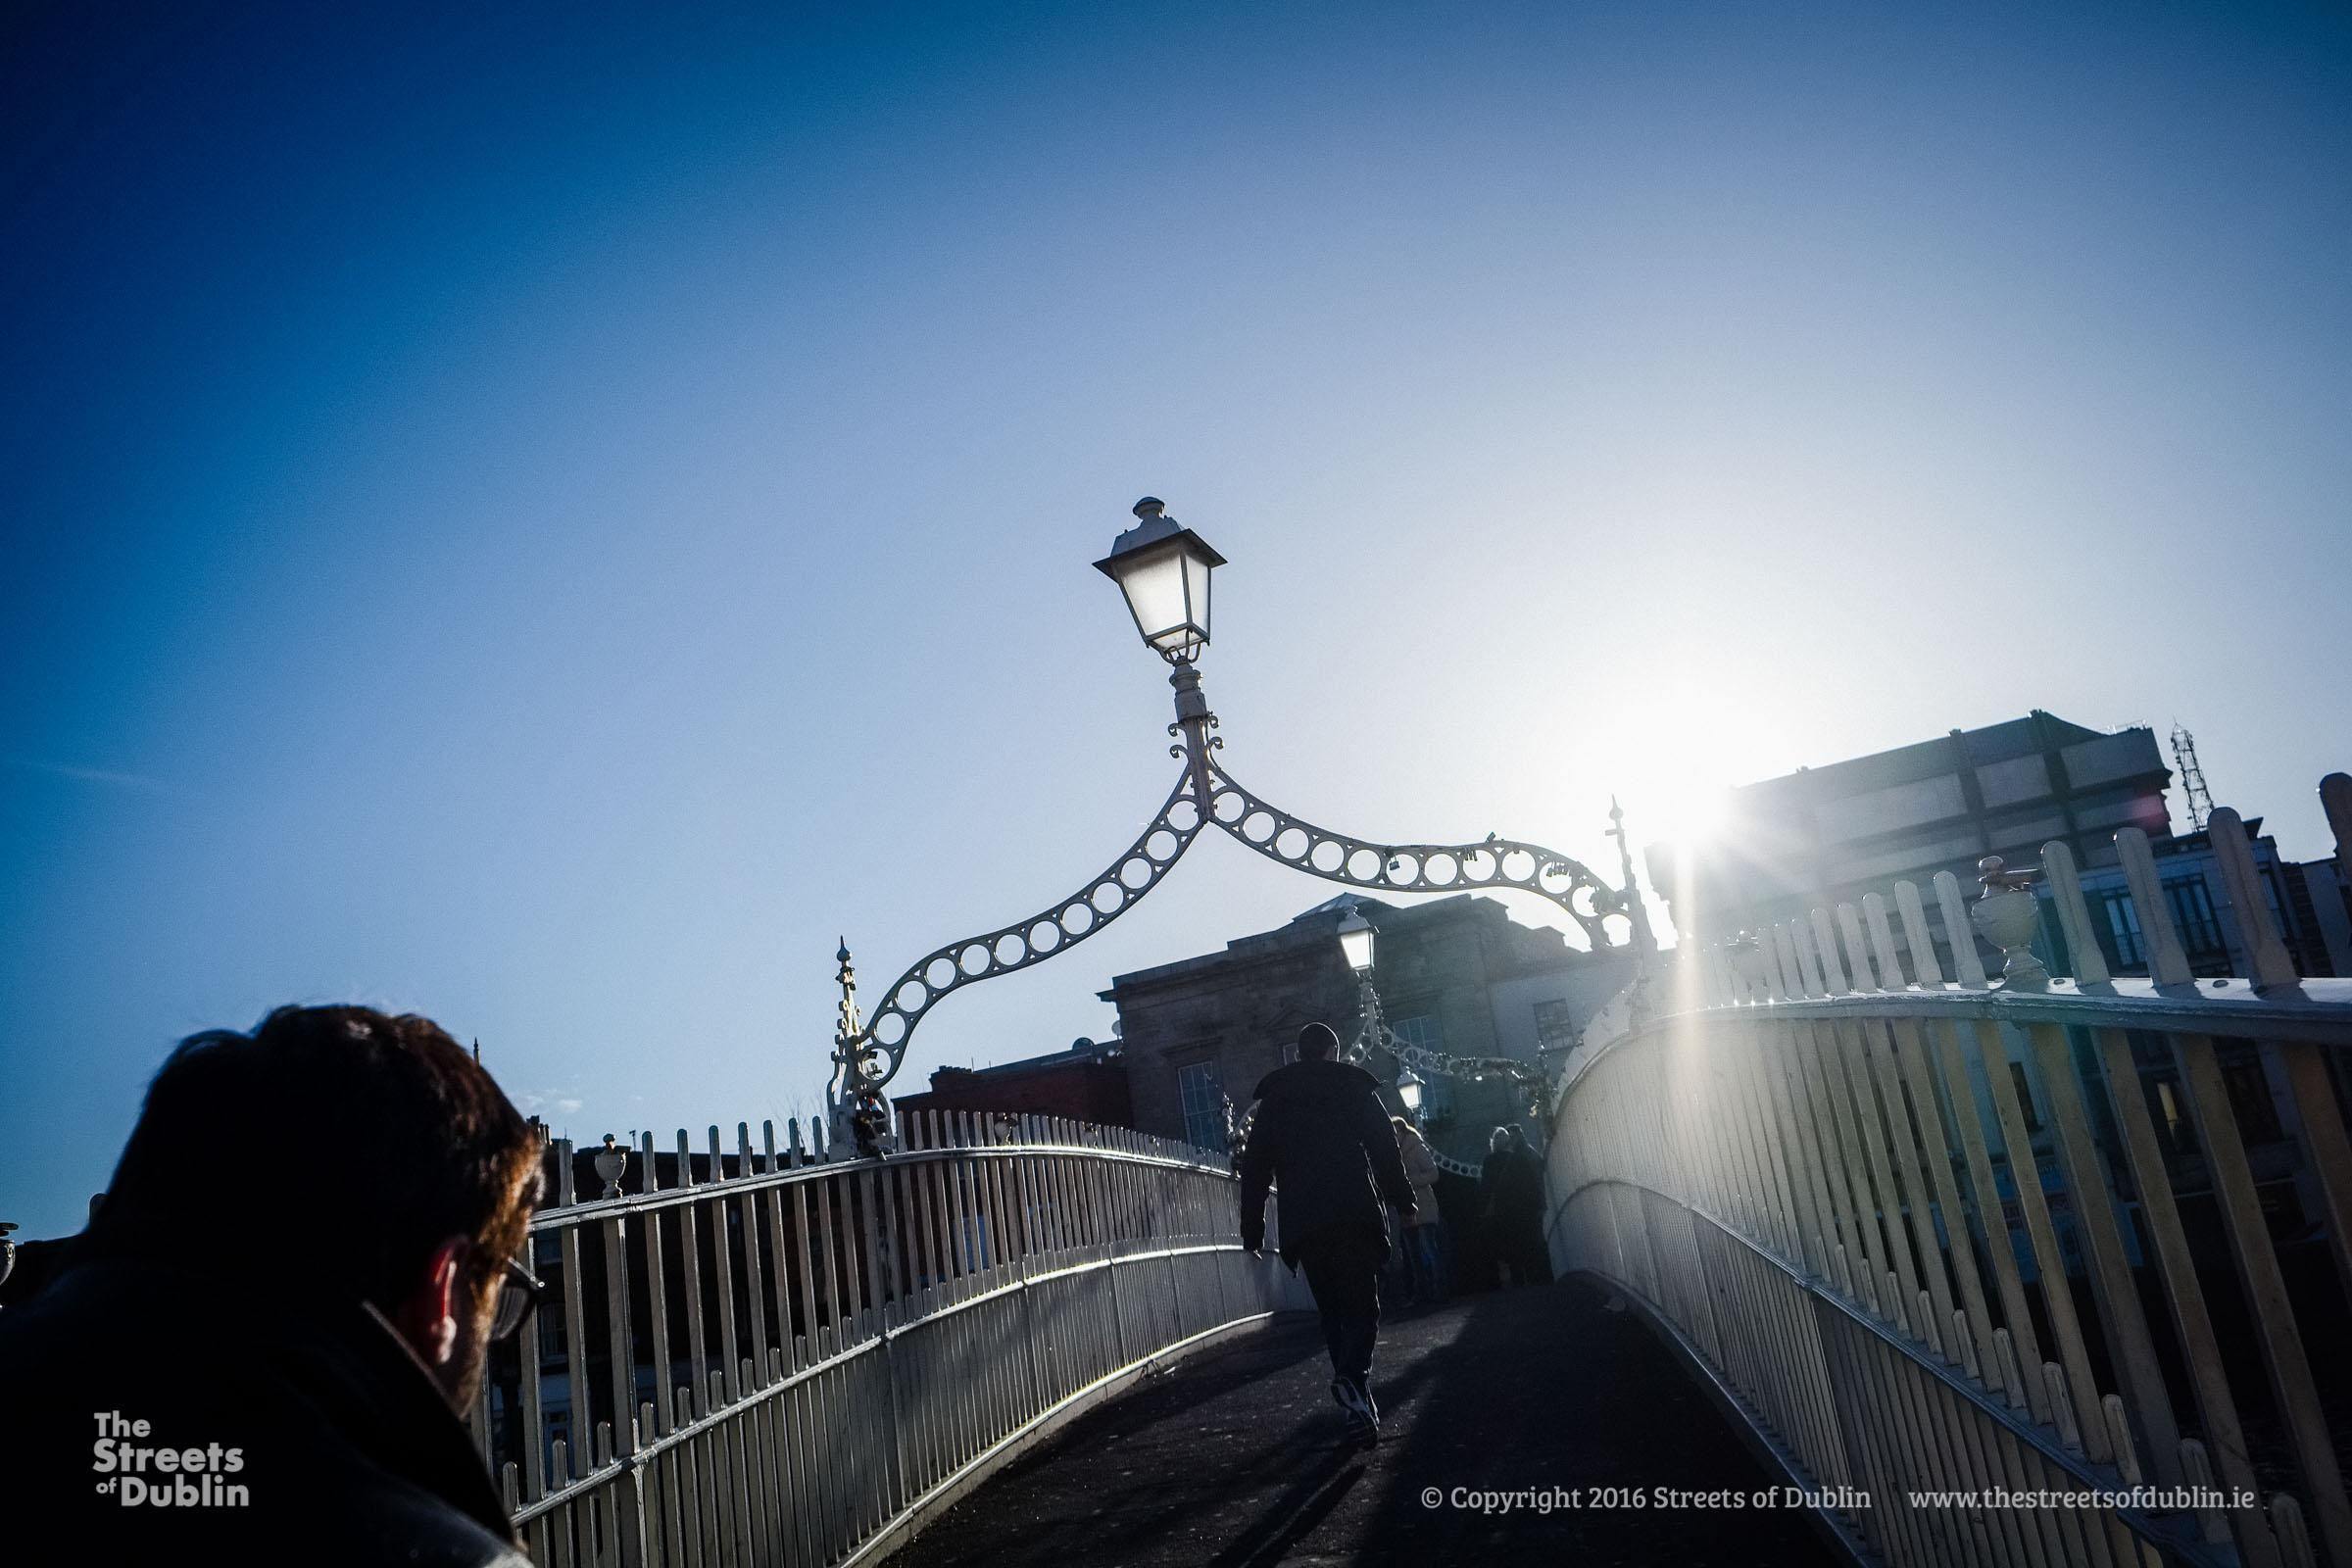 Streets-of-Dublin-Photo-2-189.jpg